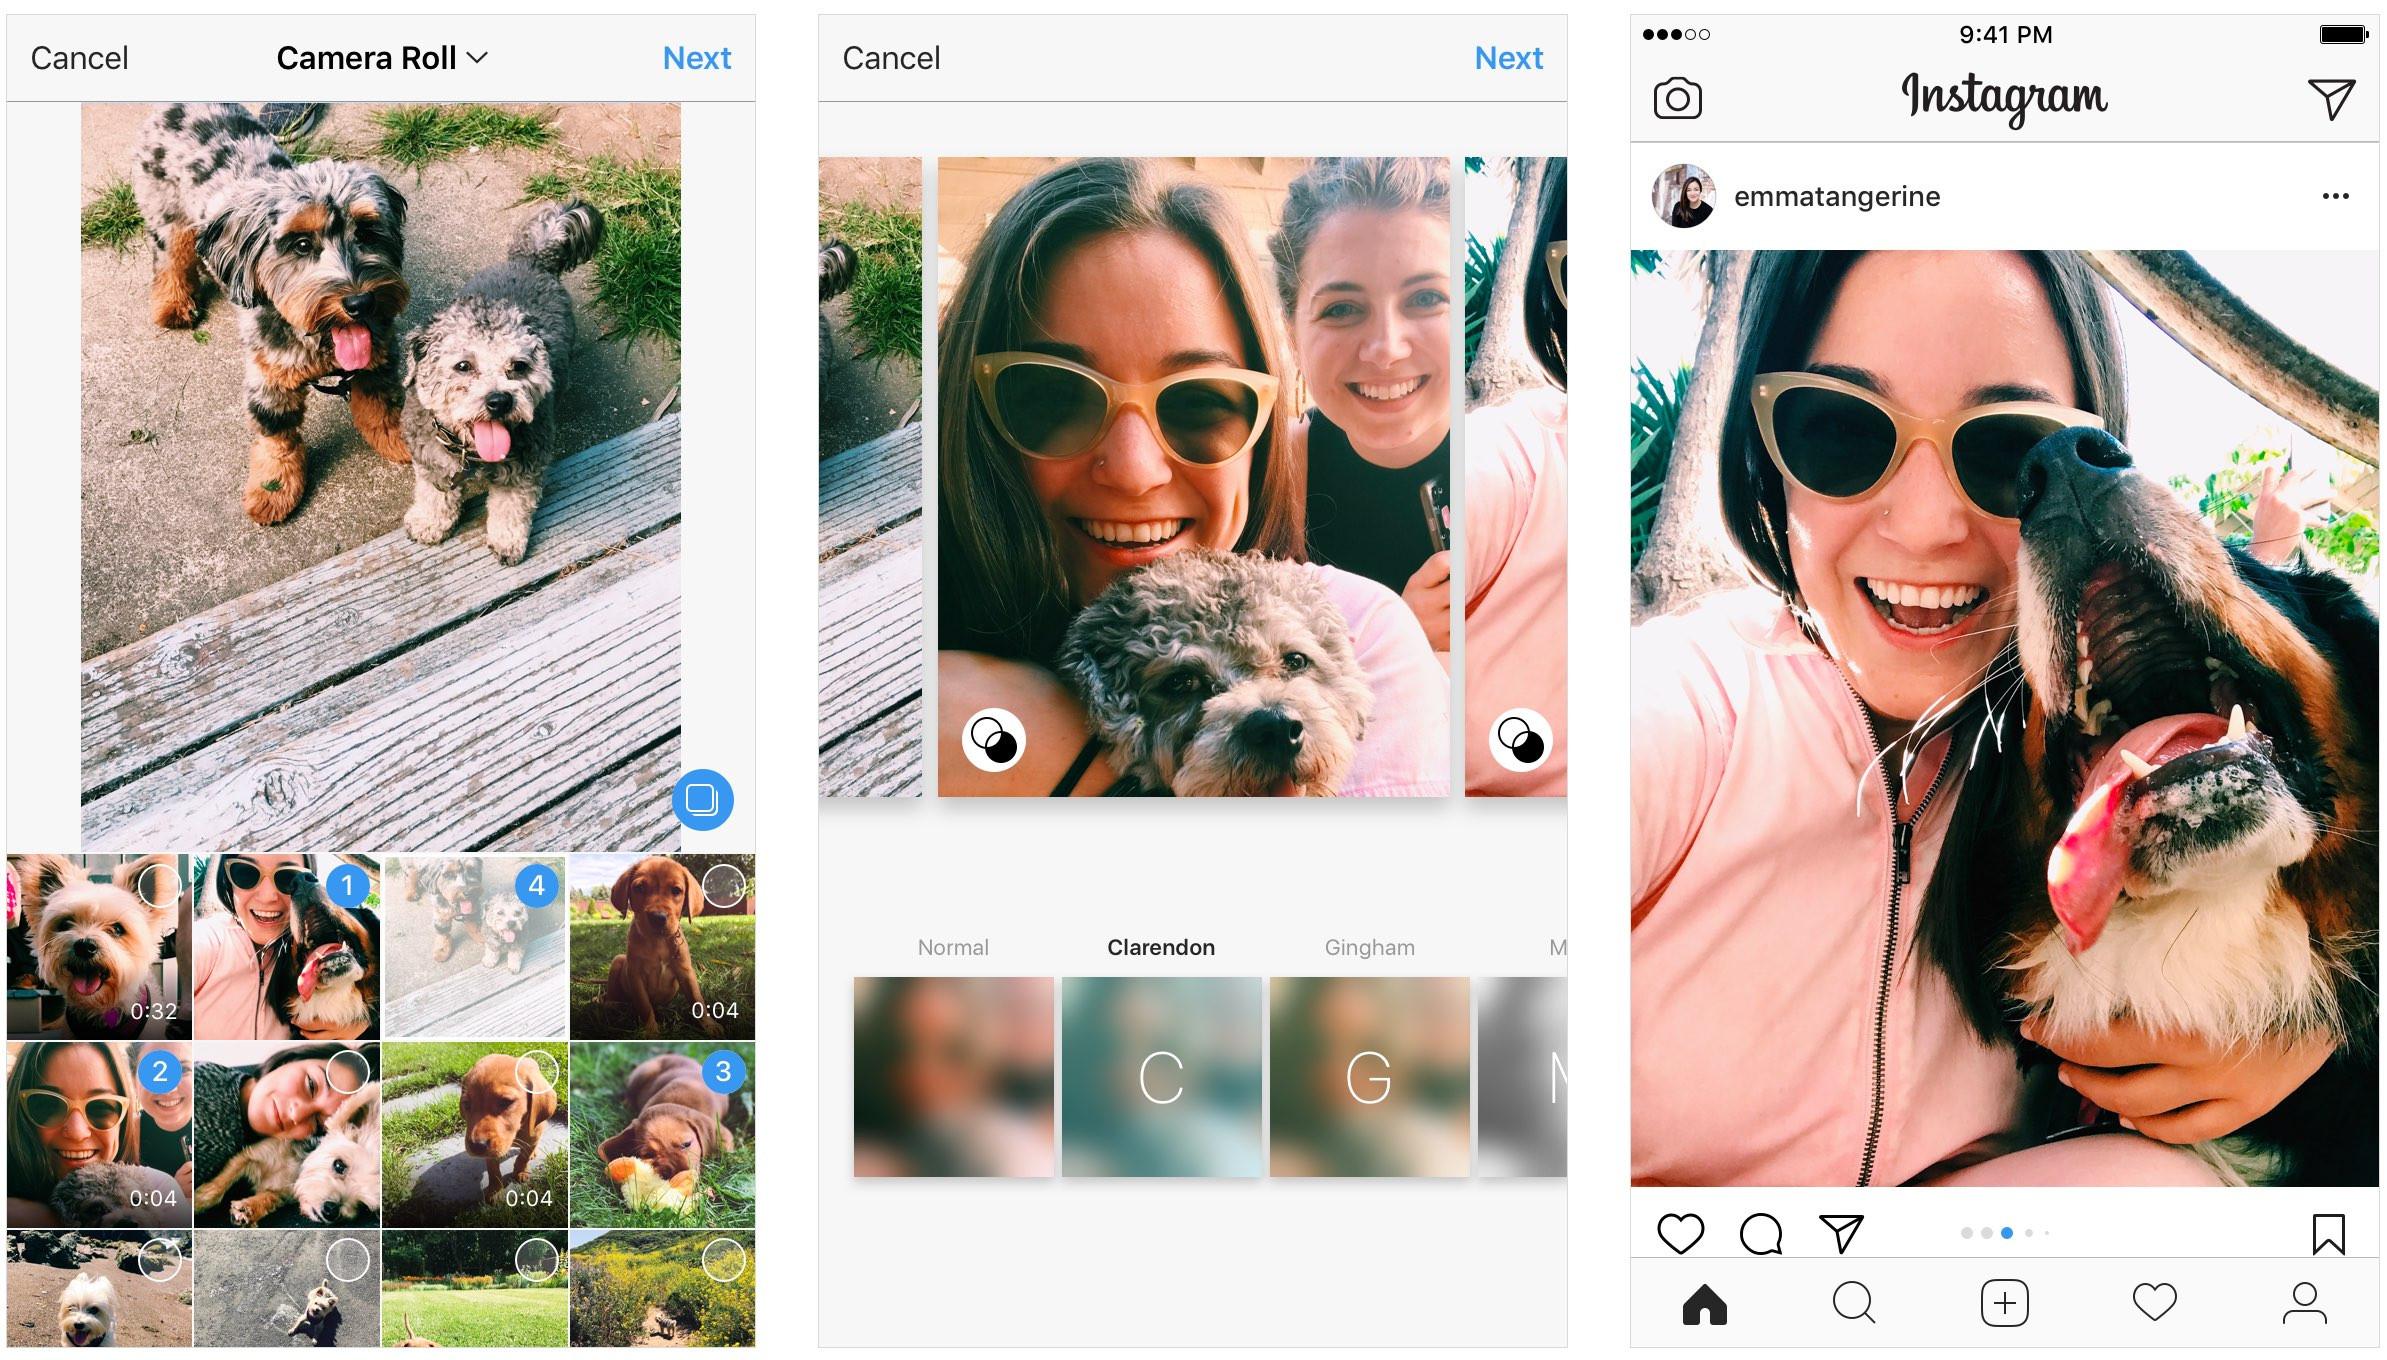 1504077295_instagram-for-ios-carousel-album-portrait-landscape-iphone-screenshot-001.jpg